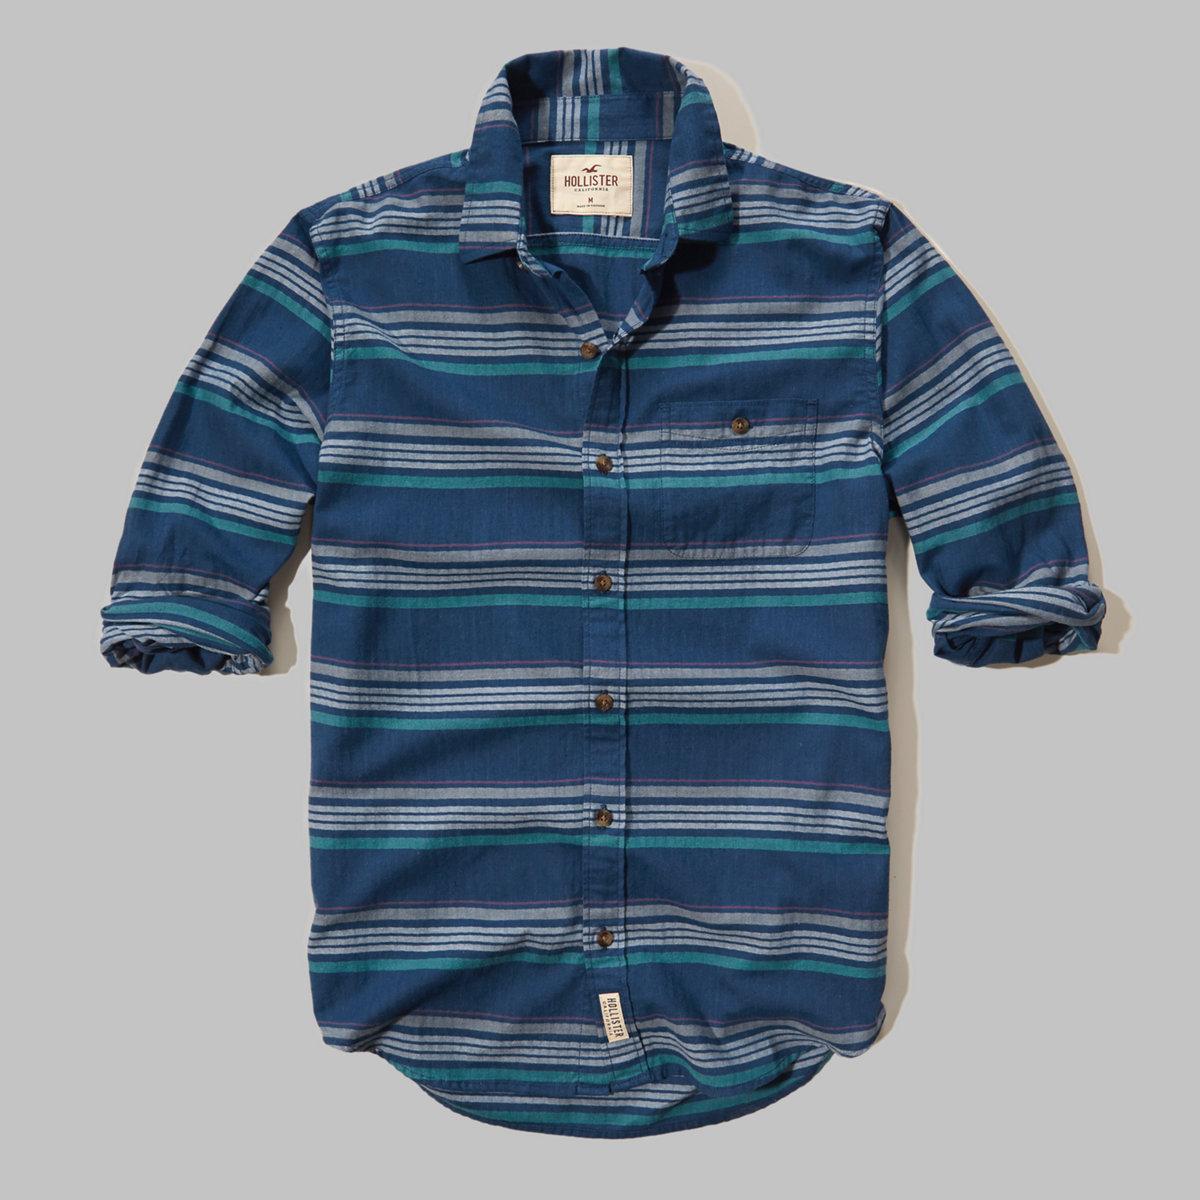 Patterned Brushed Cotton Shirt